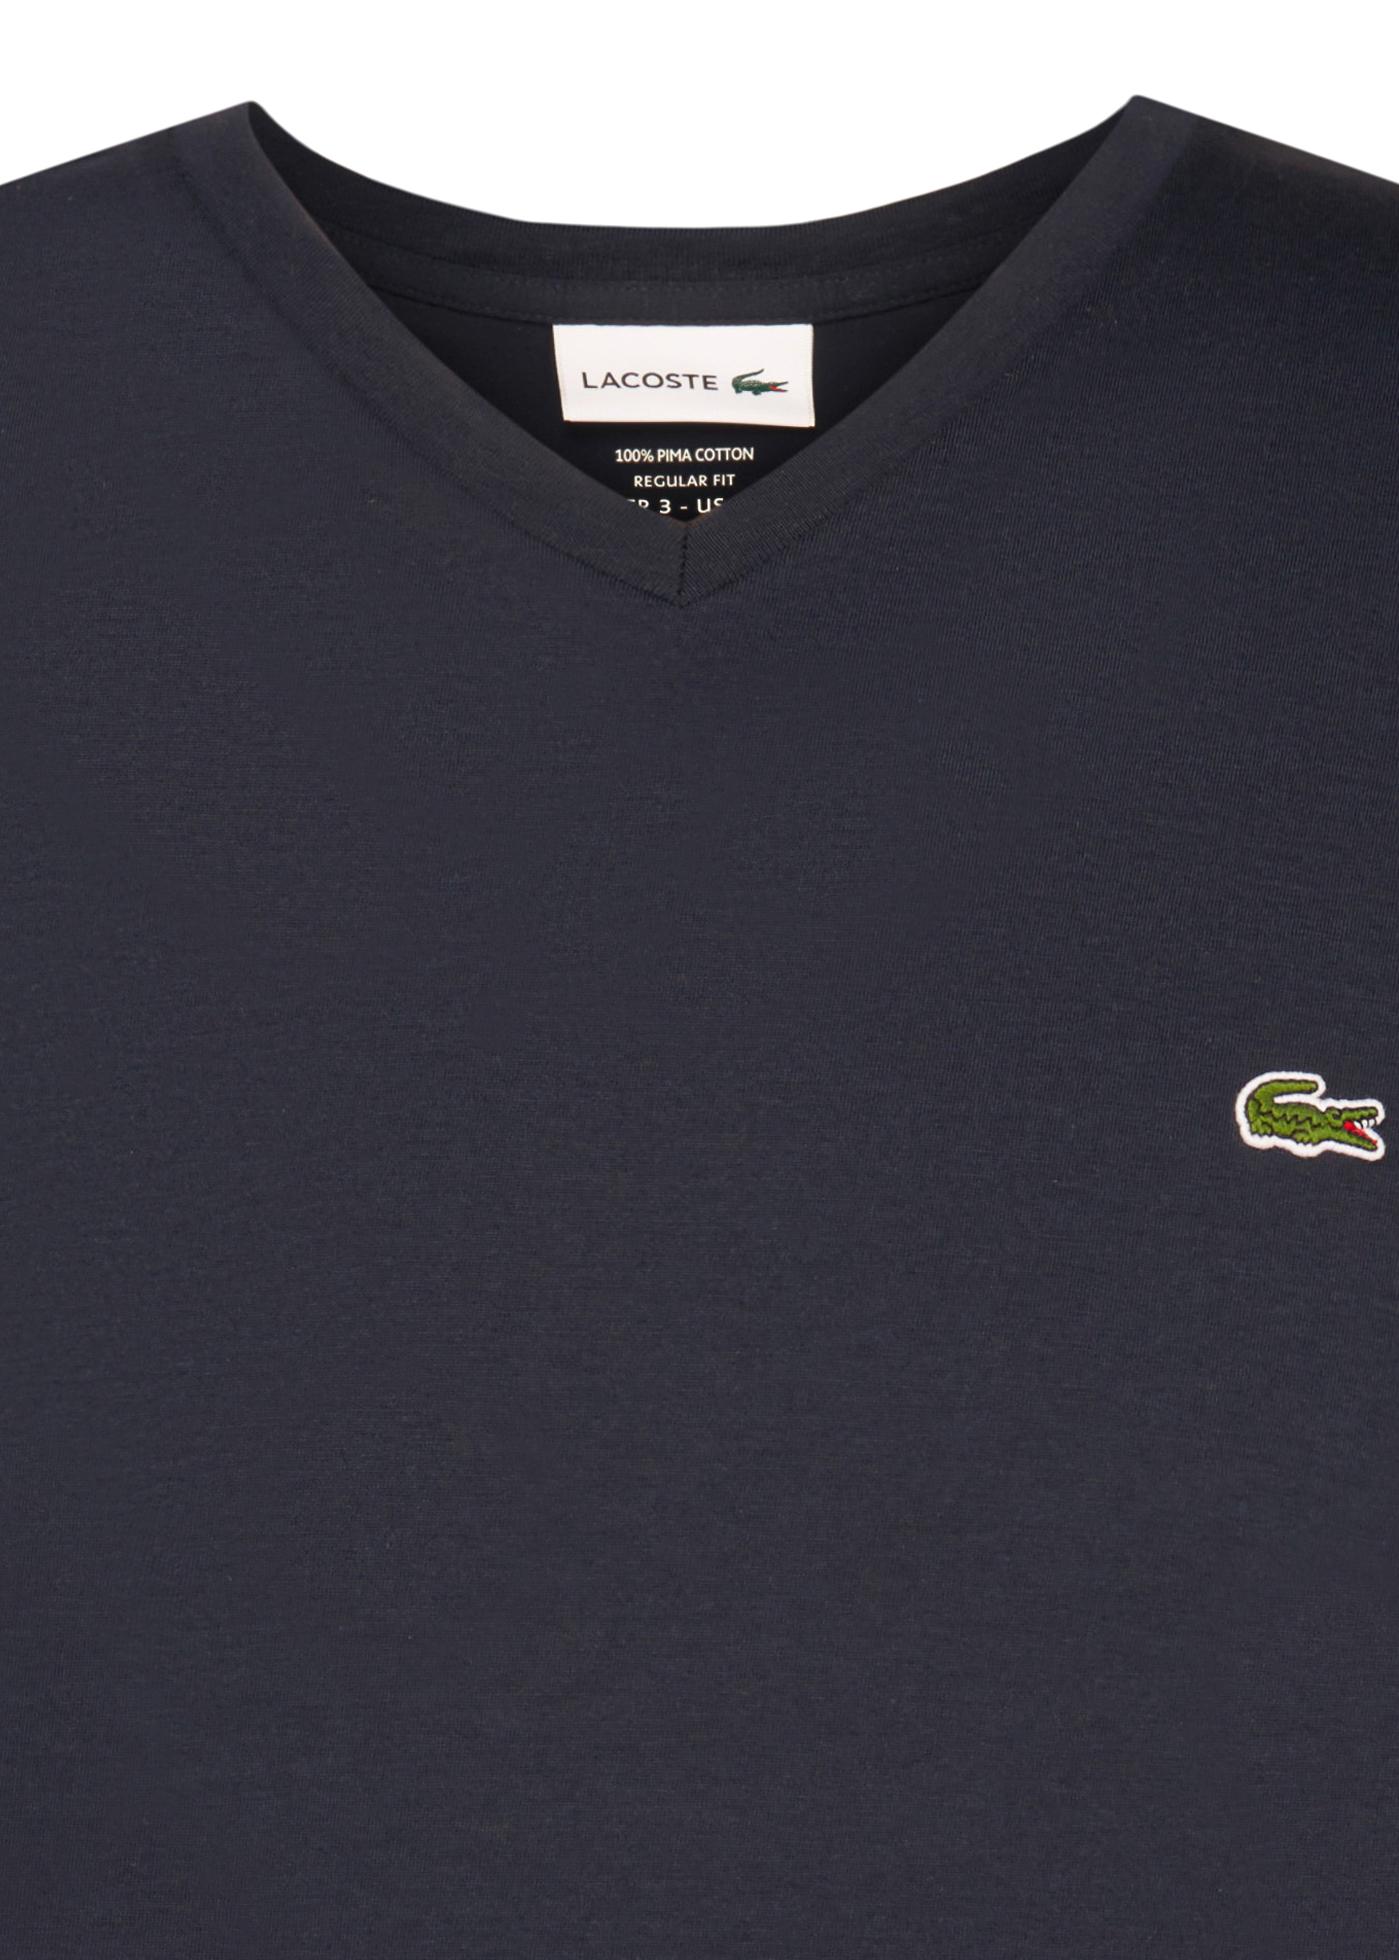 Tee-Shirt image number 2